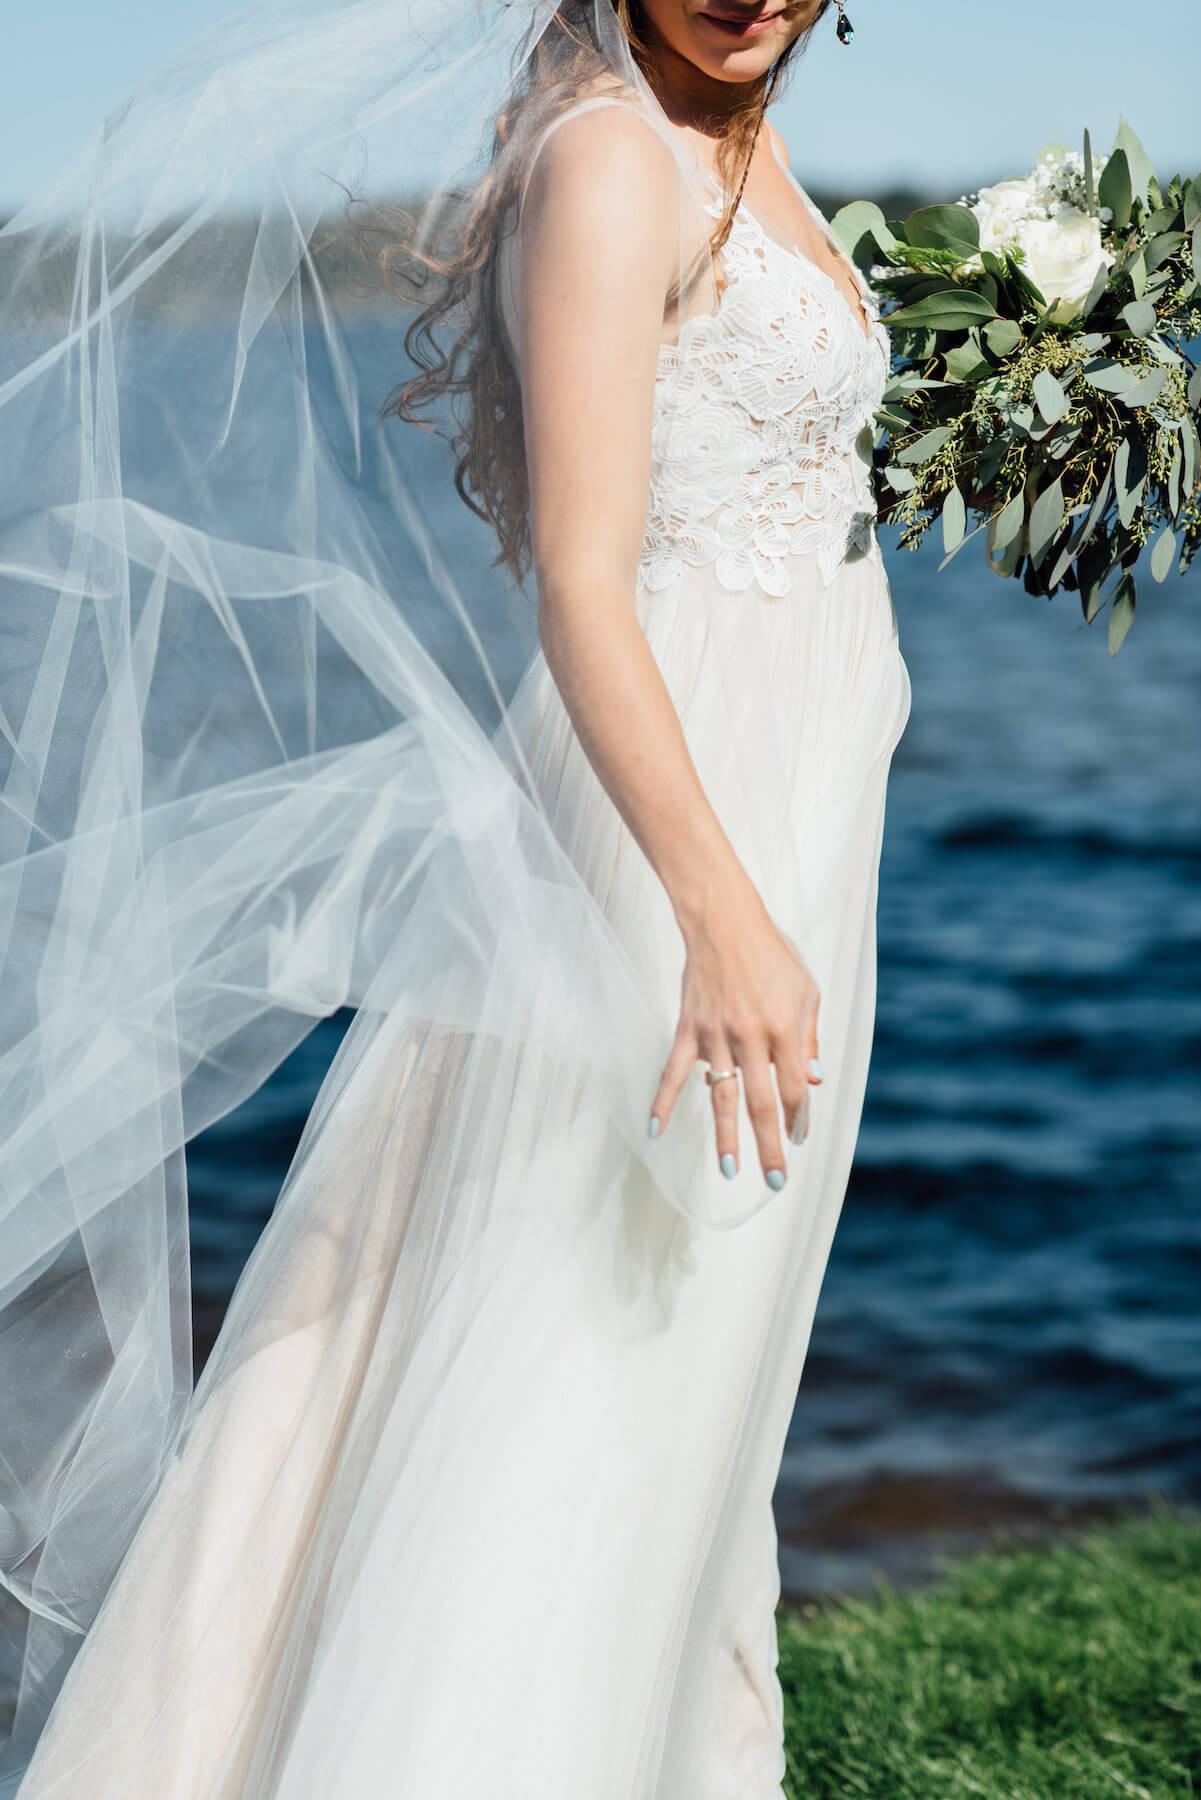 engle-olson-wedding-blair-taylor-27.jpg